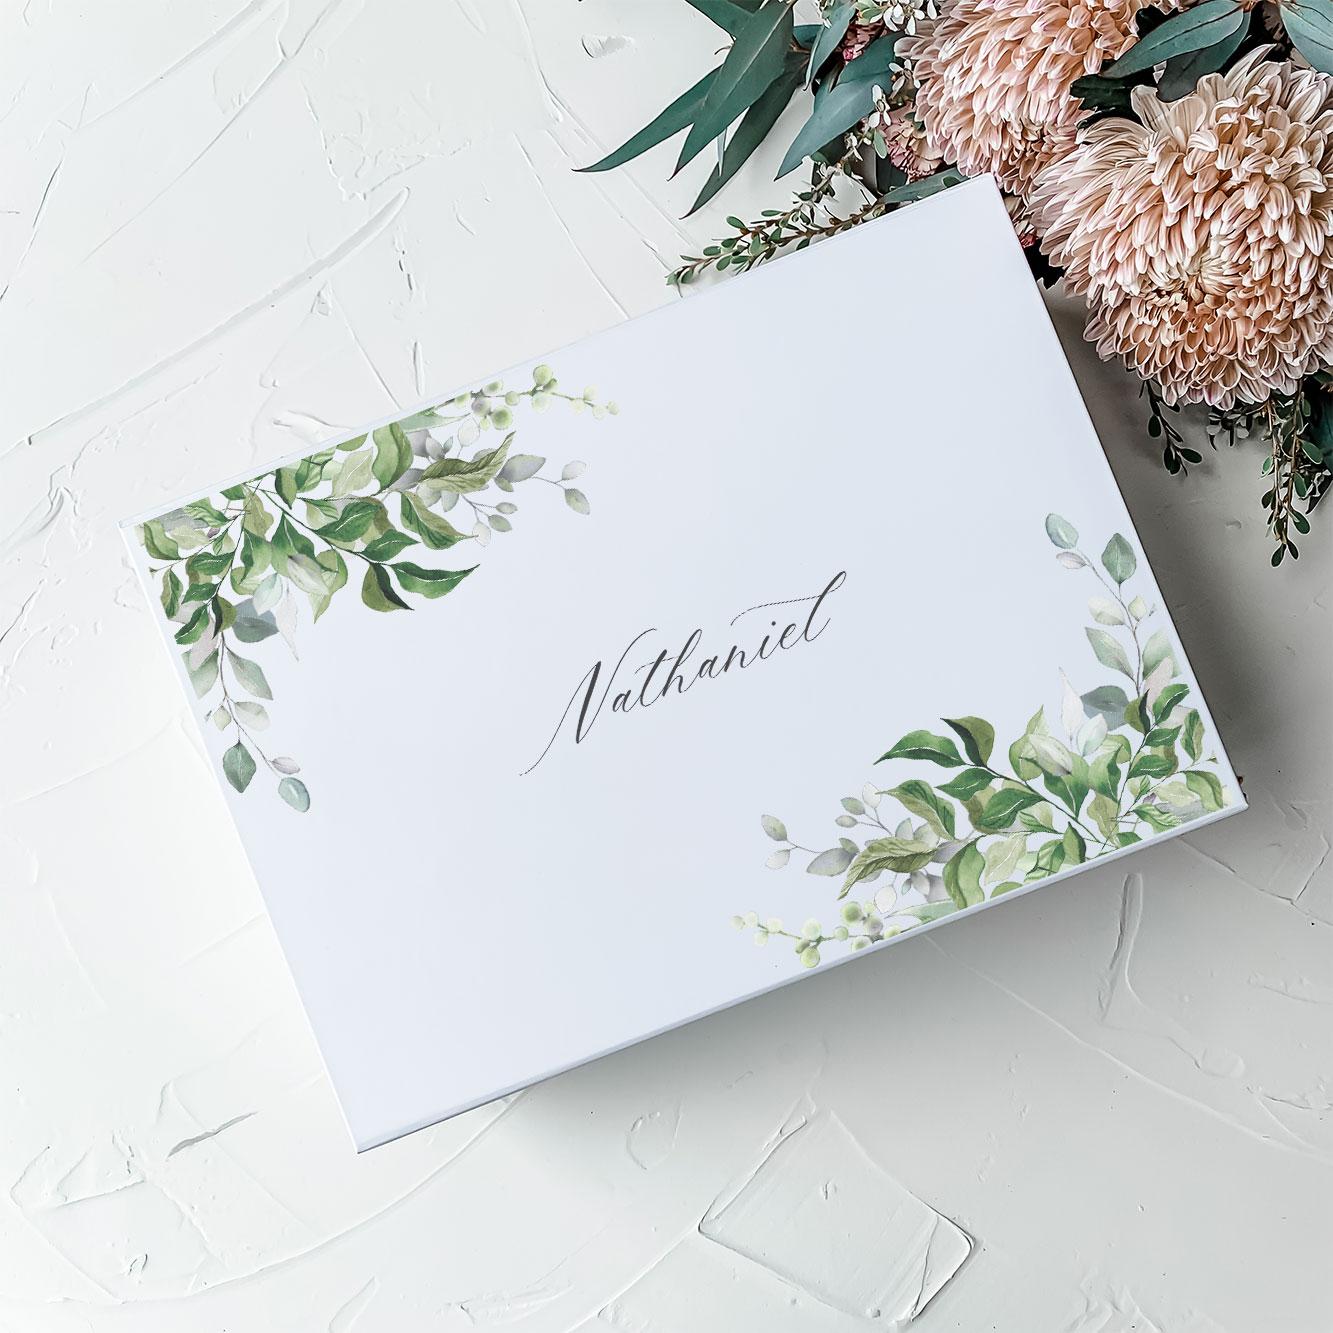 Personalised Gift Boxes and Bridesmaid Boxes, Perth WA